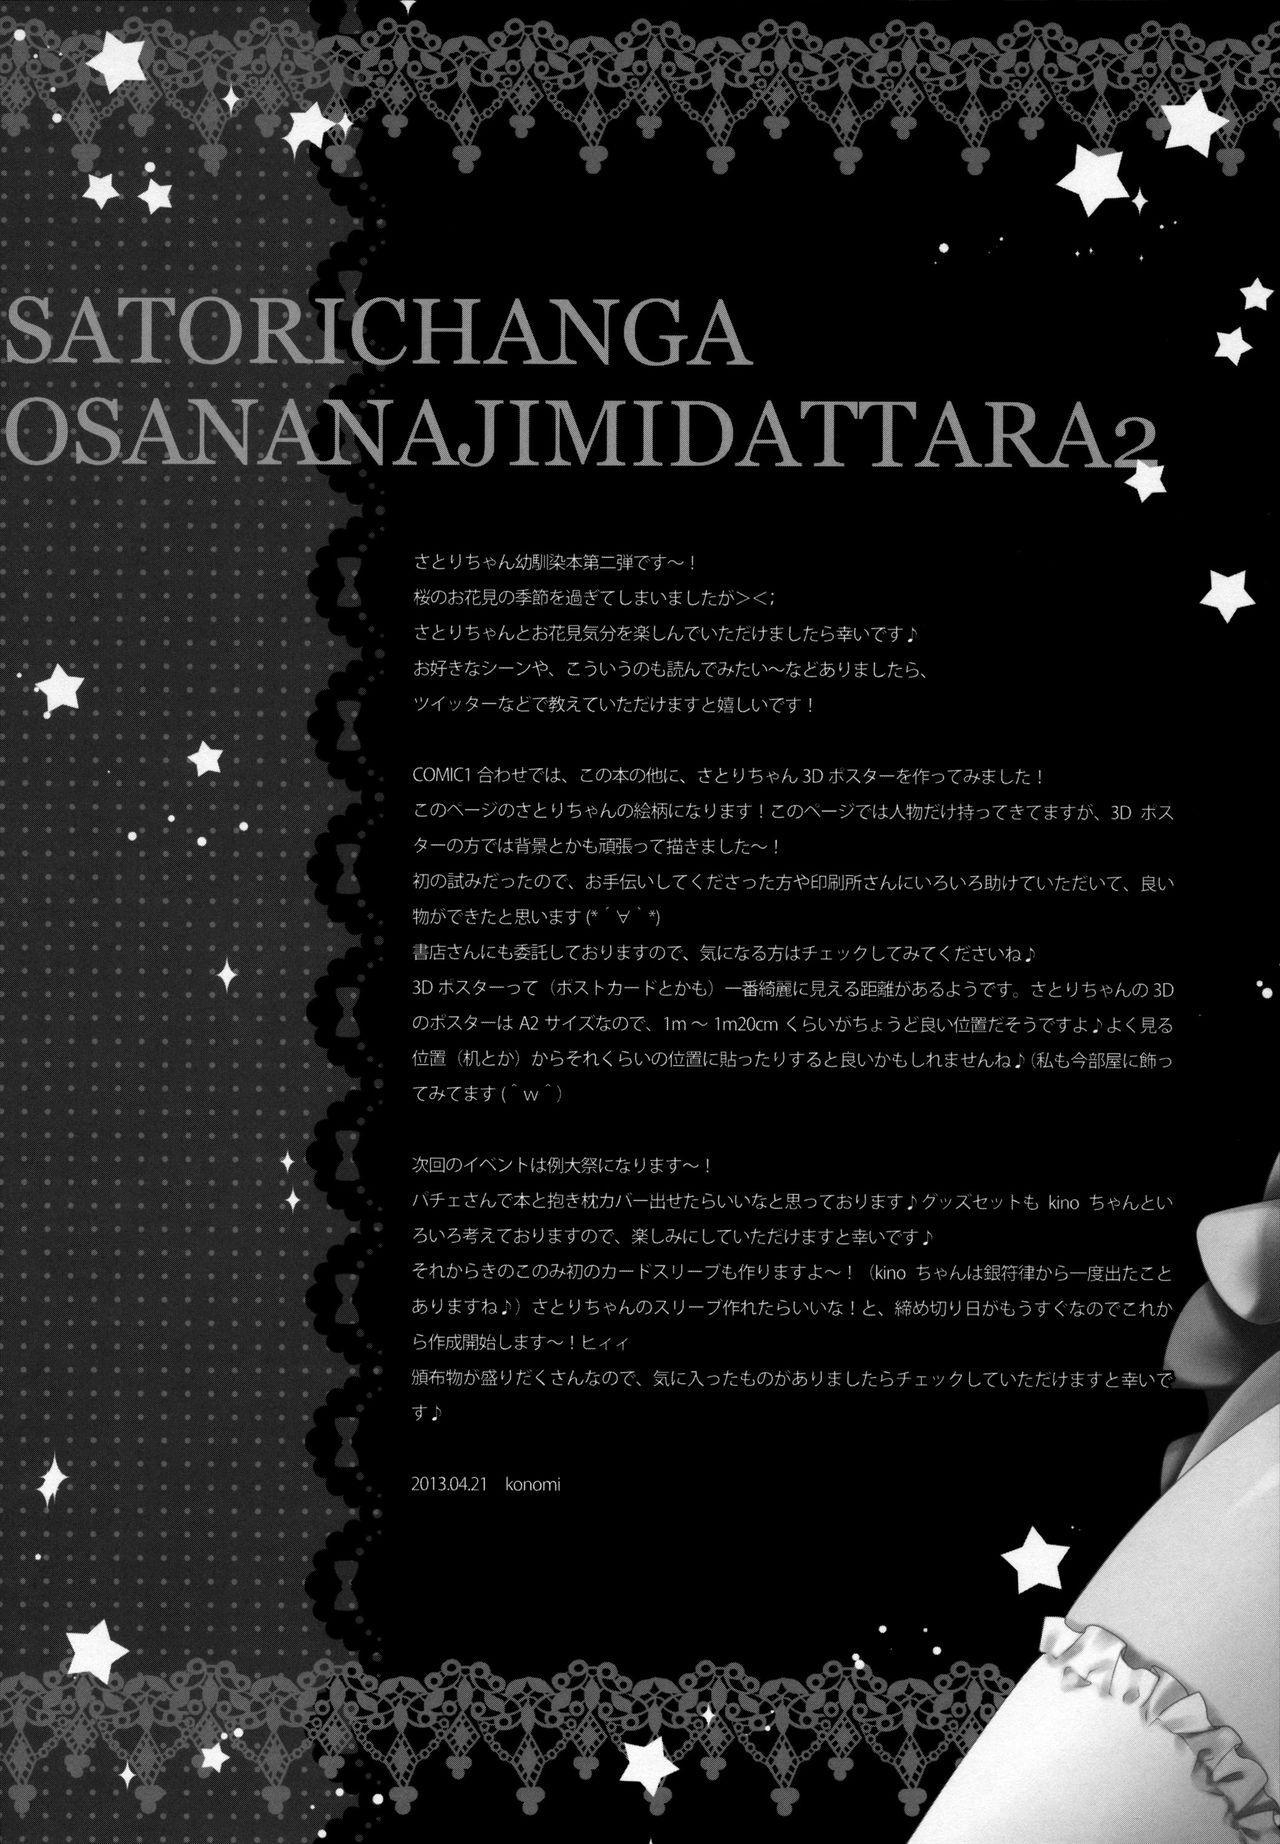 (COMIC1☆7) [KINOKONOMI (konomi)] Satori-chan ga Osananajimi Dattara ~Ohanami Date Hen~   Satori-chan is My Childhood Friend ~Flower Viewing Date~ (Touhou Project) [English] {Hennojin} 14